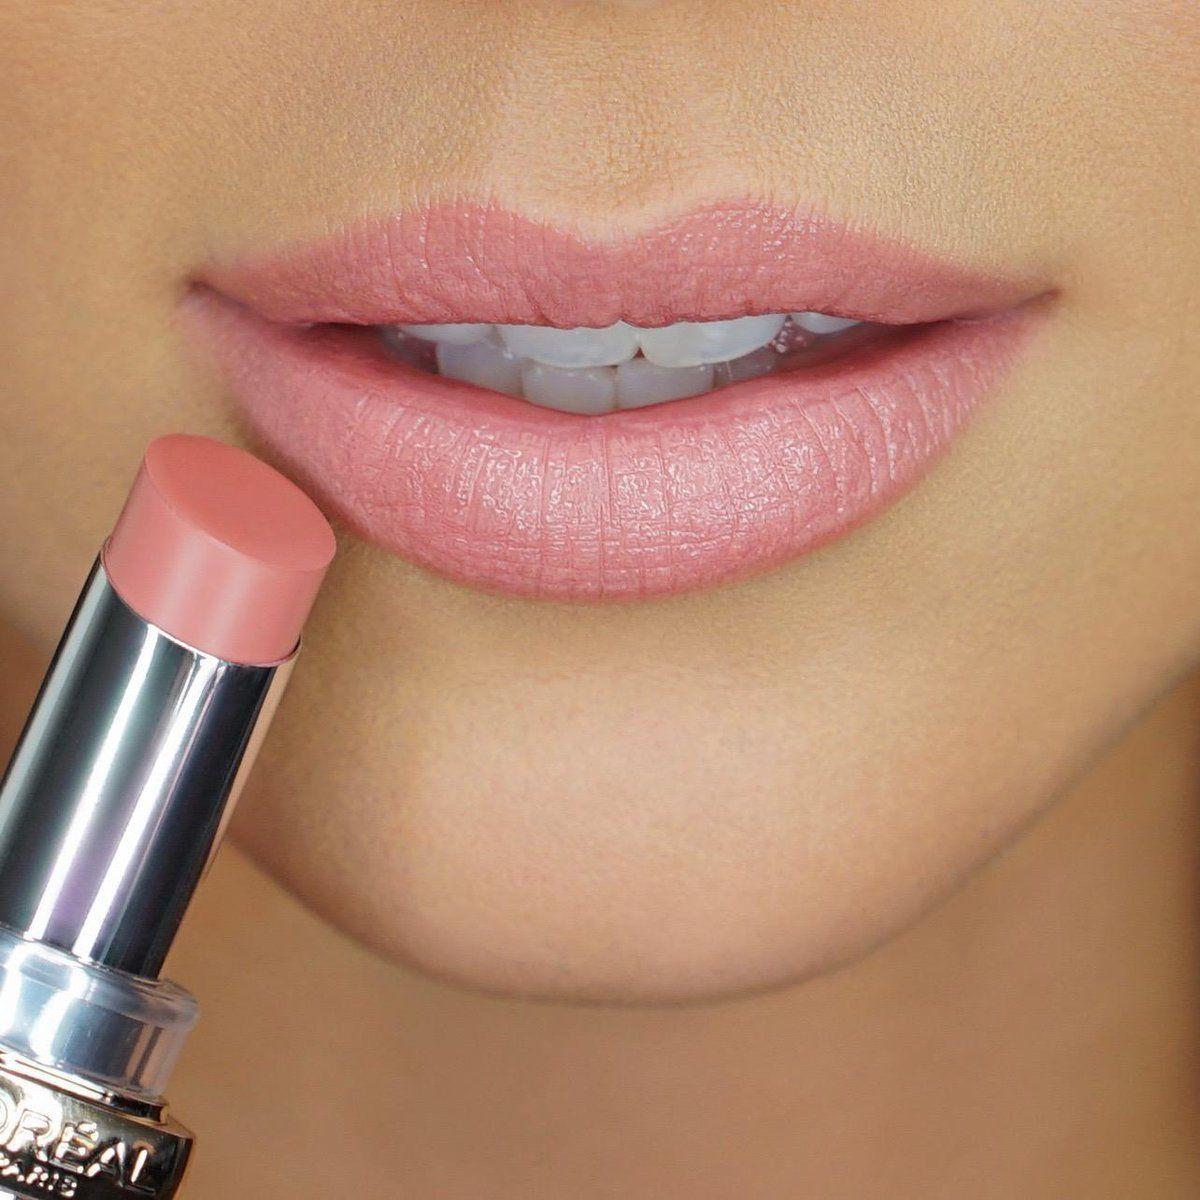 Photo of L & # 39; Oréal Paris Color Riche Shine Lipstick in Farbton 910 Sparkling P …